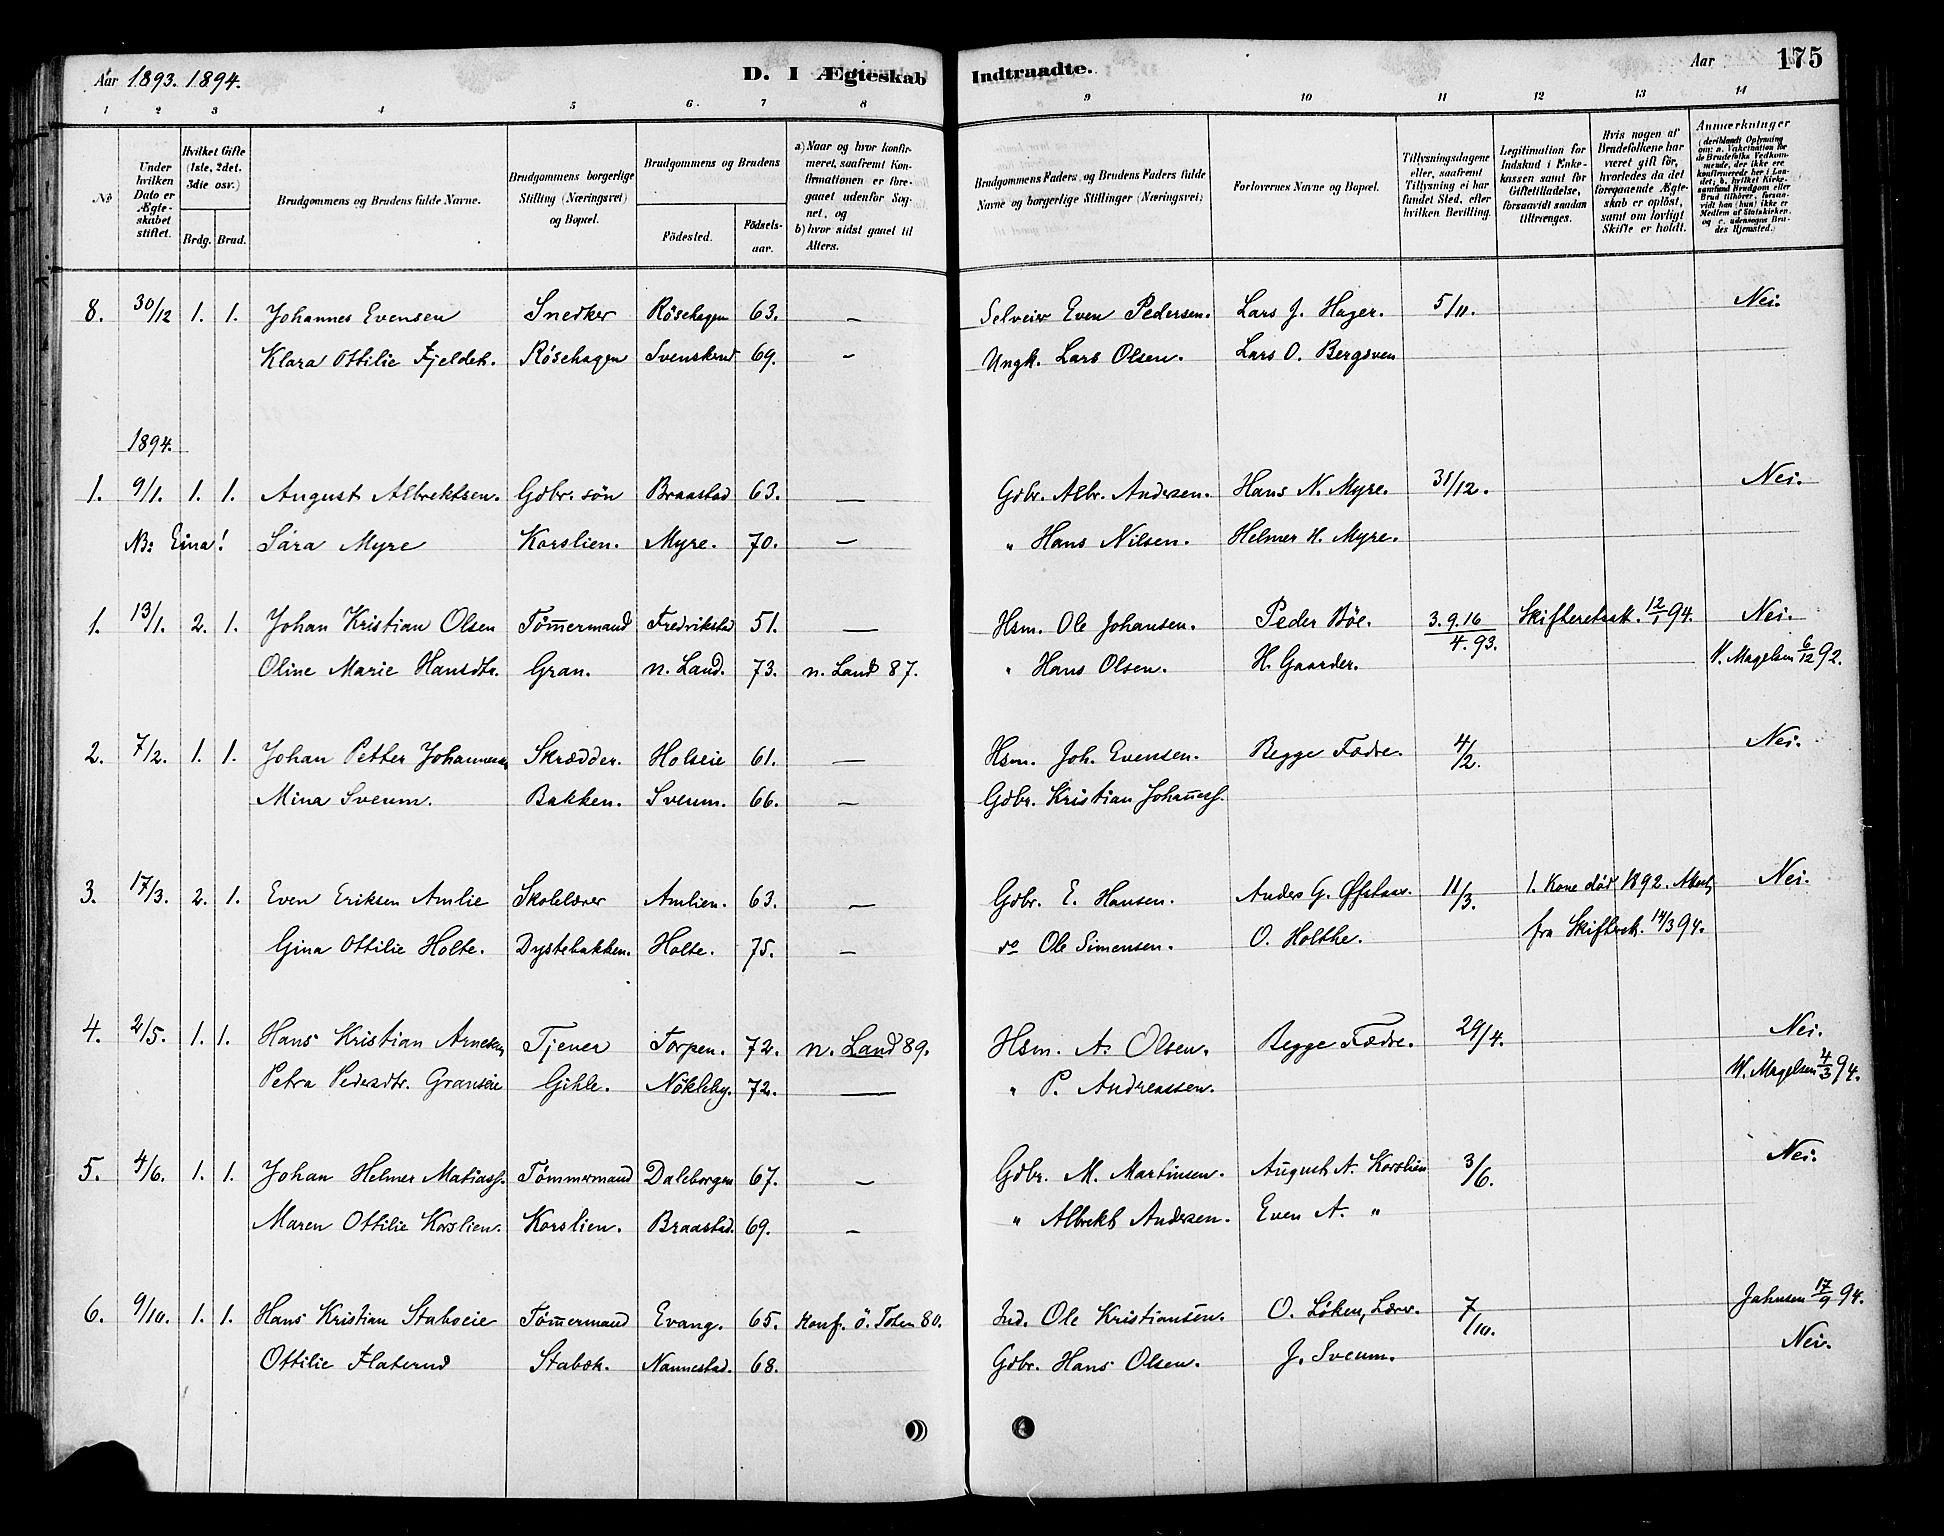 SAH, Vestre Toten prestekontor, H/Ha/Haa/L0010: Ministerialbok nr. 10, 1878-1894, s. 175